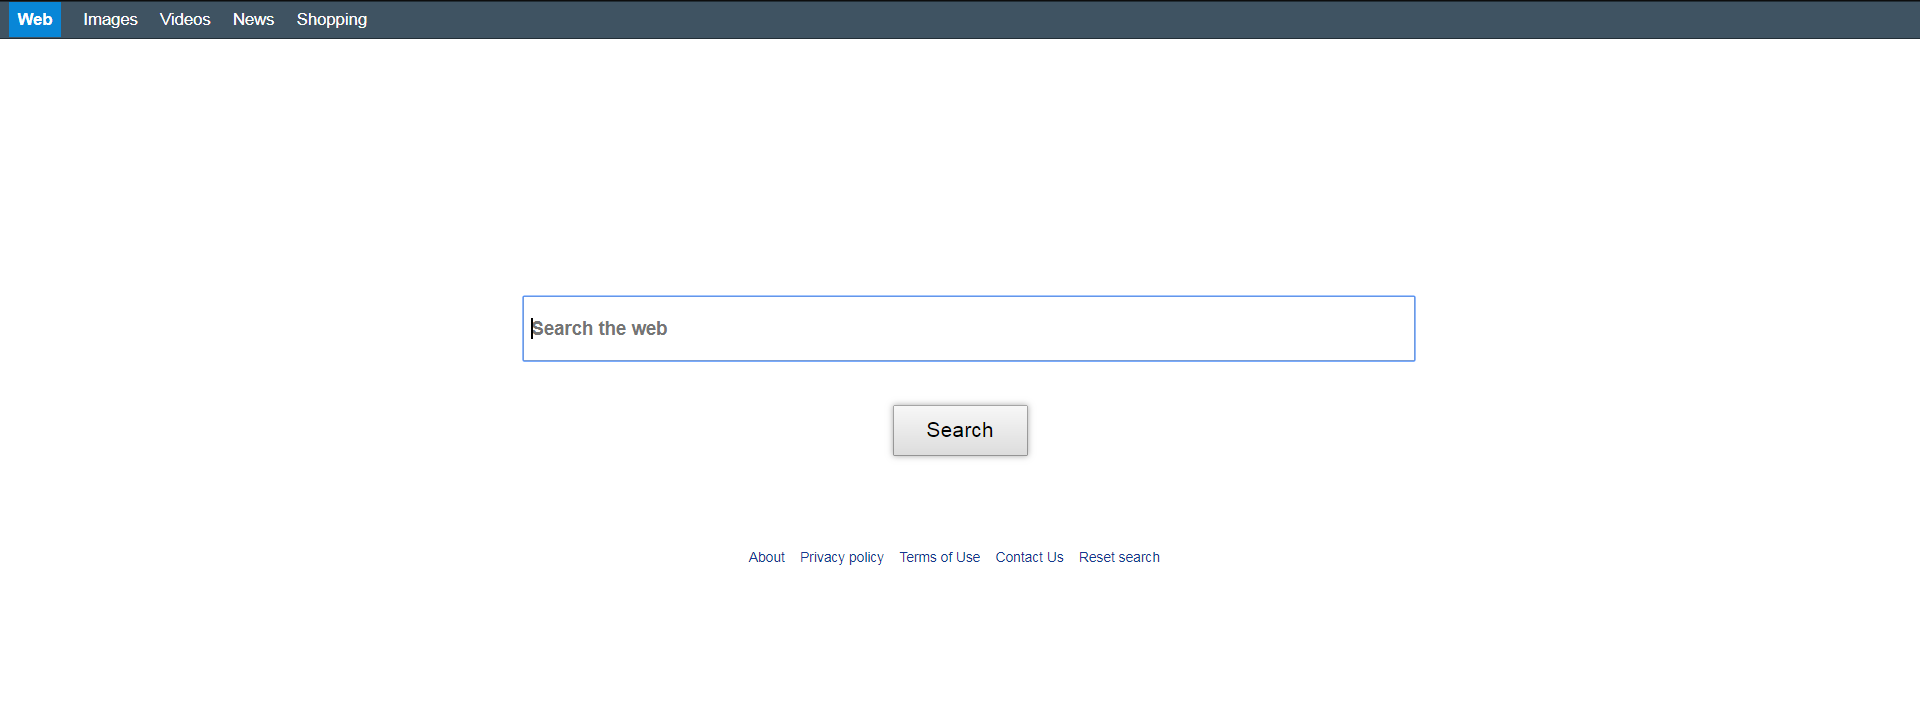 Delete http://search.mogobiggy.com/ virus from Mac